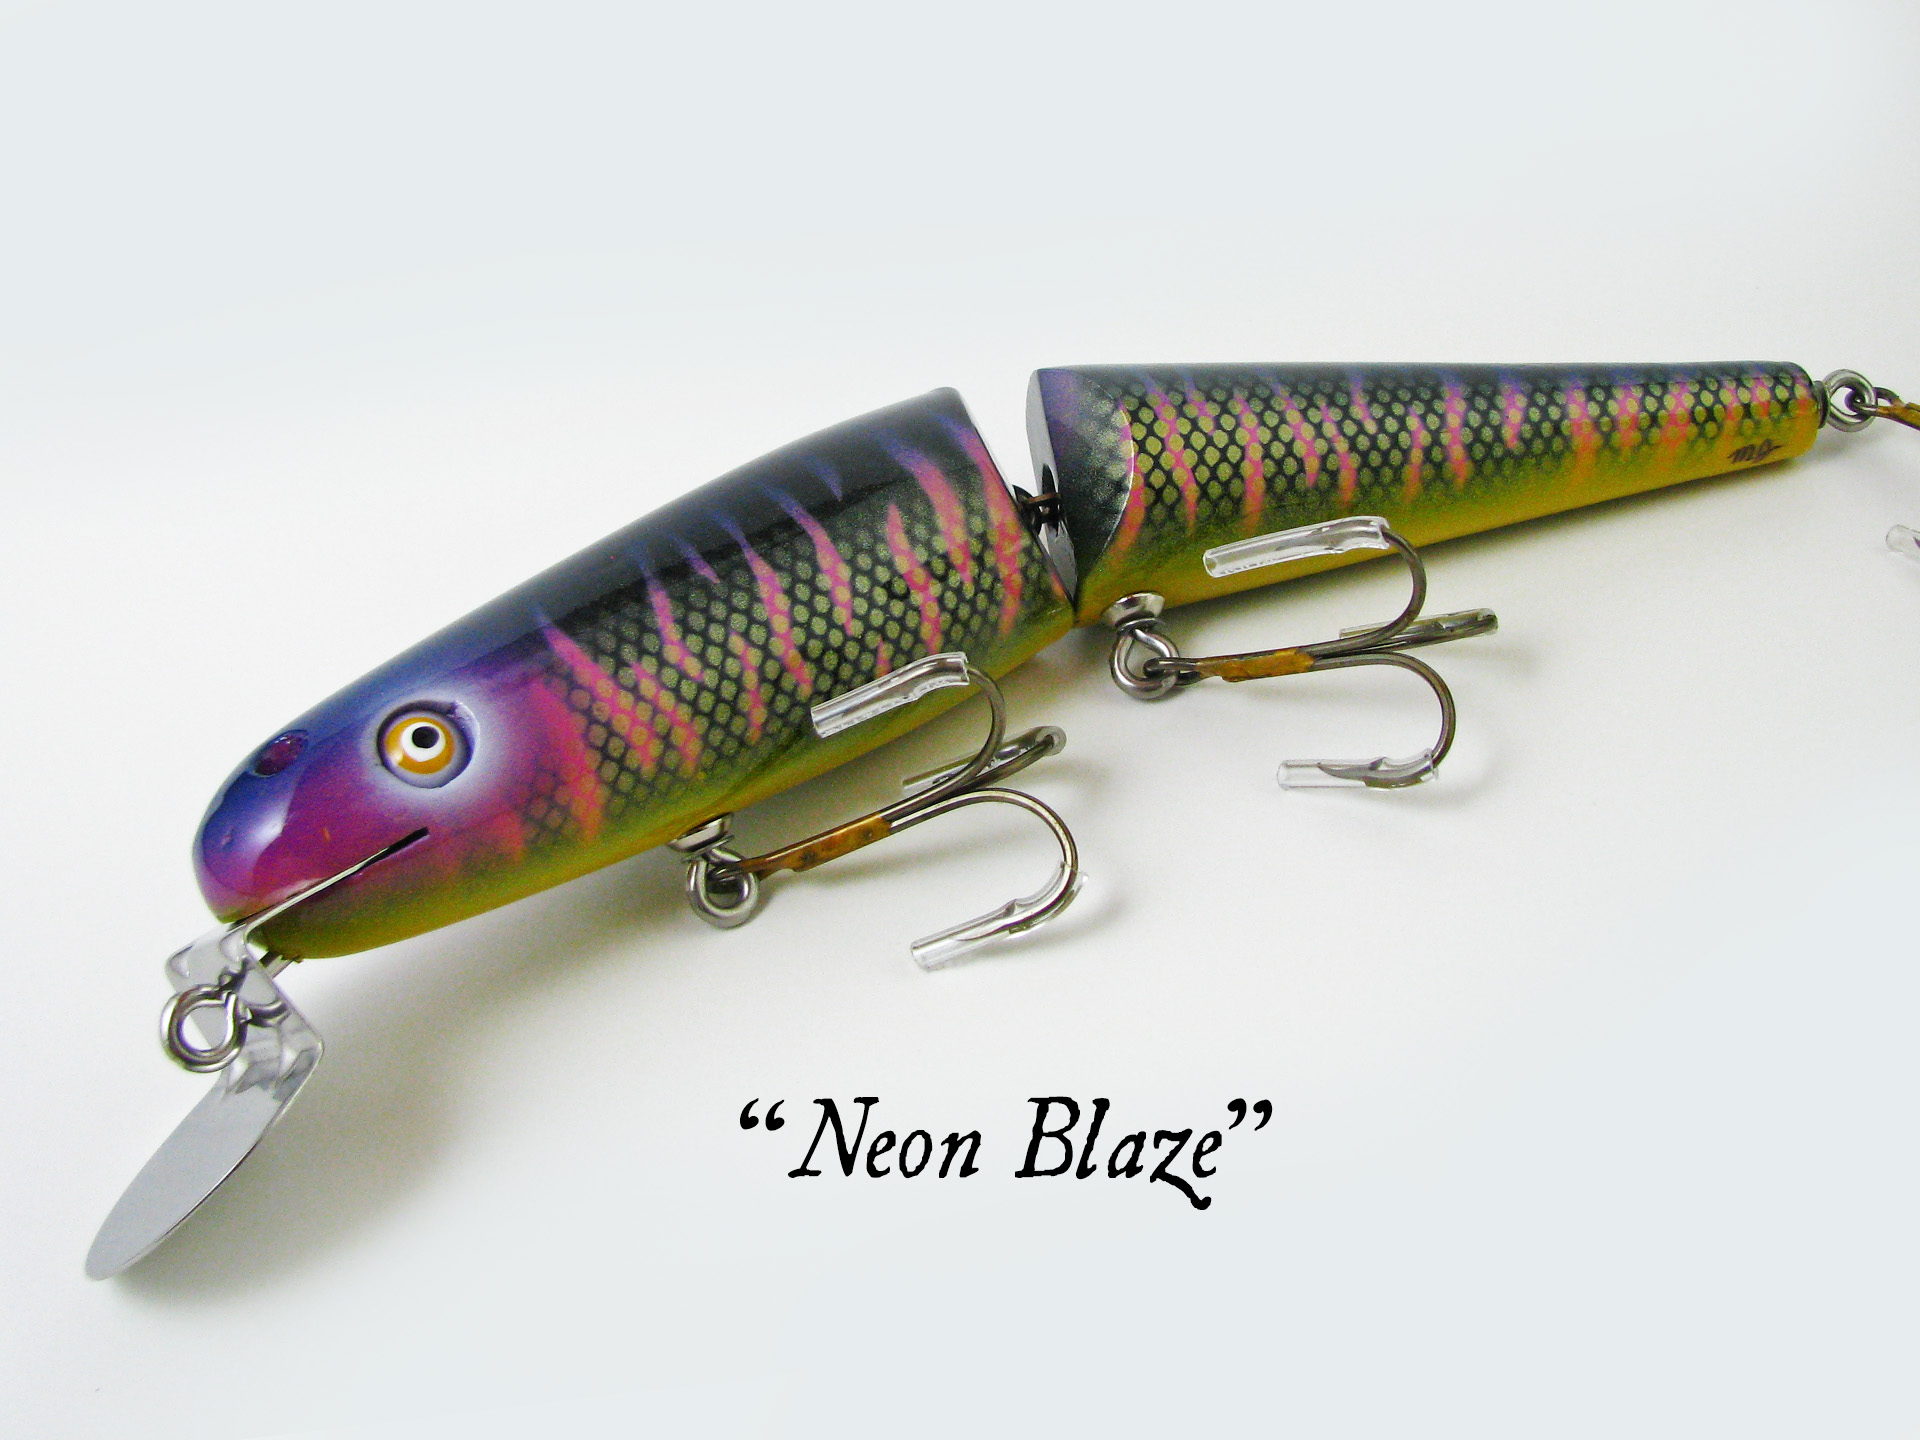 Jointed Chautauqua Minnow_Neon Blaze.jpg